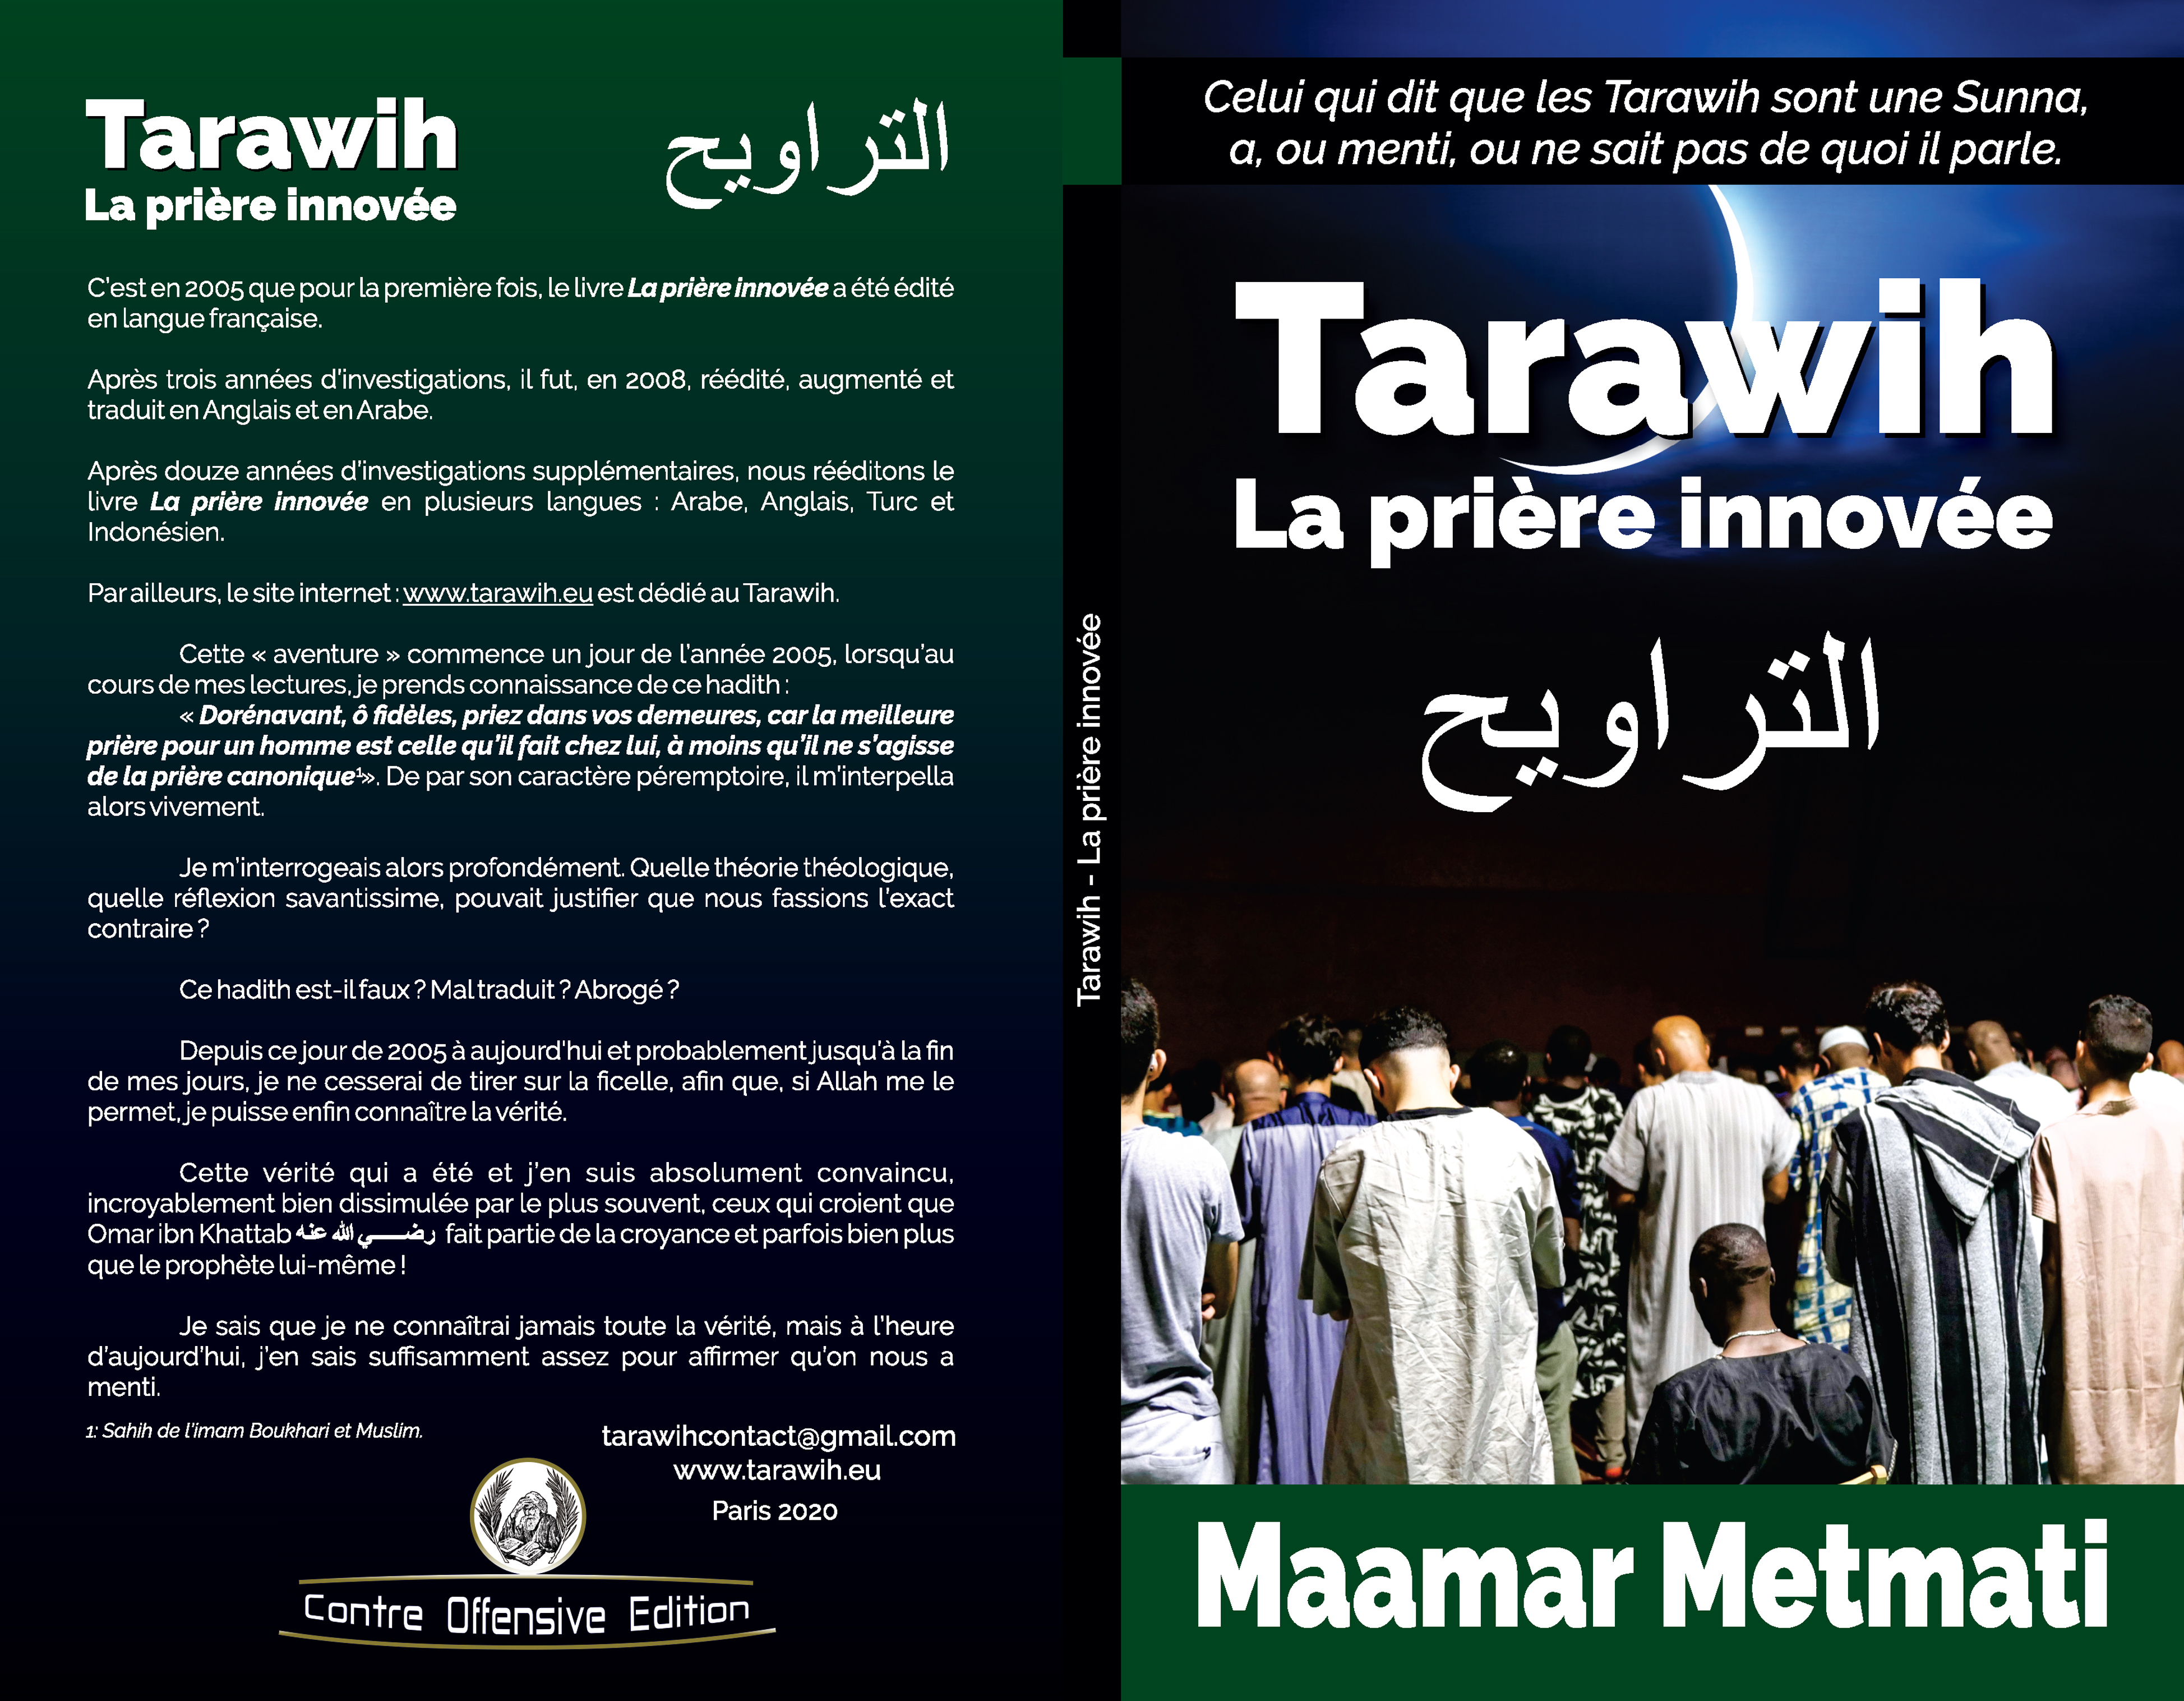 Tarawih, la prière innovée